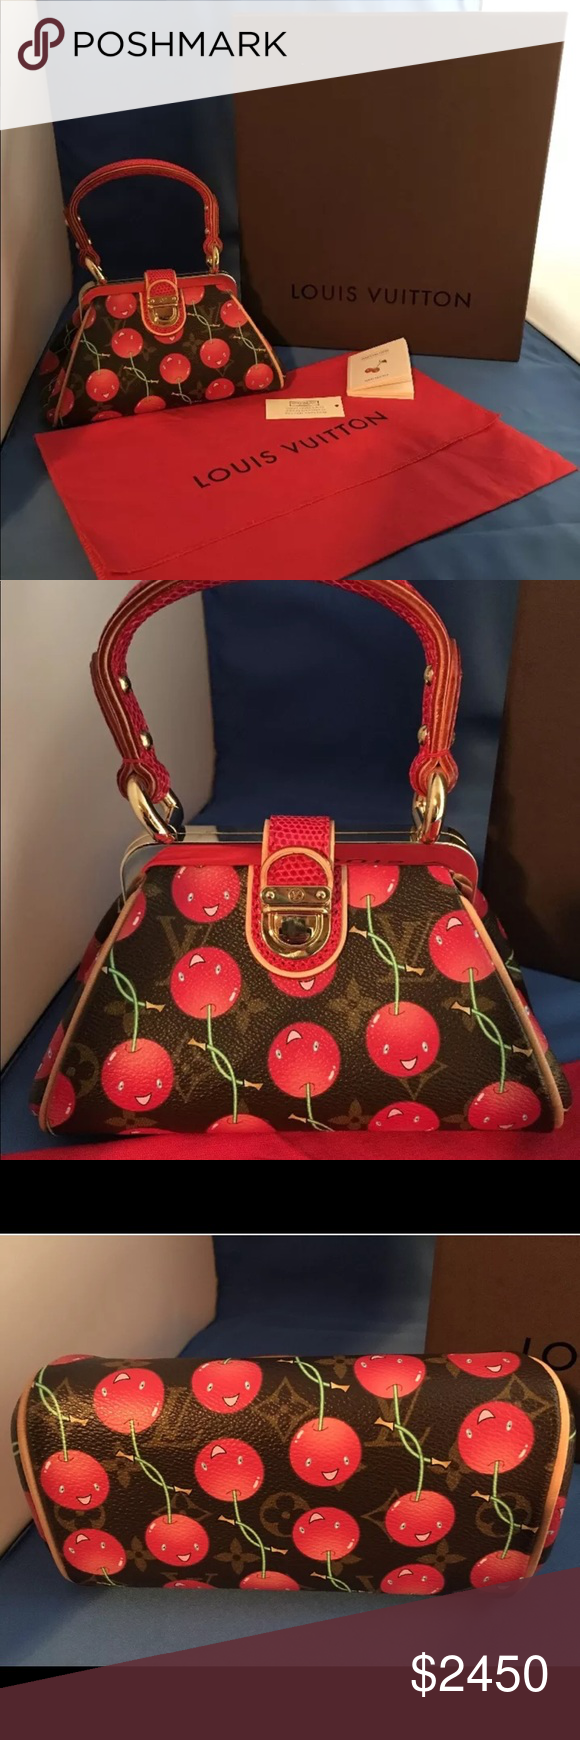 d71688a161a1 Spotted while shopping on Poshmark  Louis Vuitton Monogram Takashi Murakami  Purse 👛!  poshmark  fashion  shopping  style  Louis Vuitton  Handbags